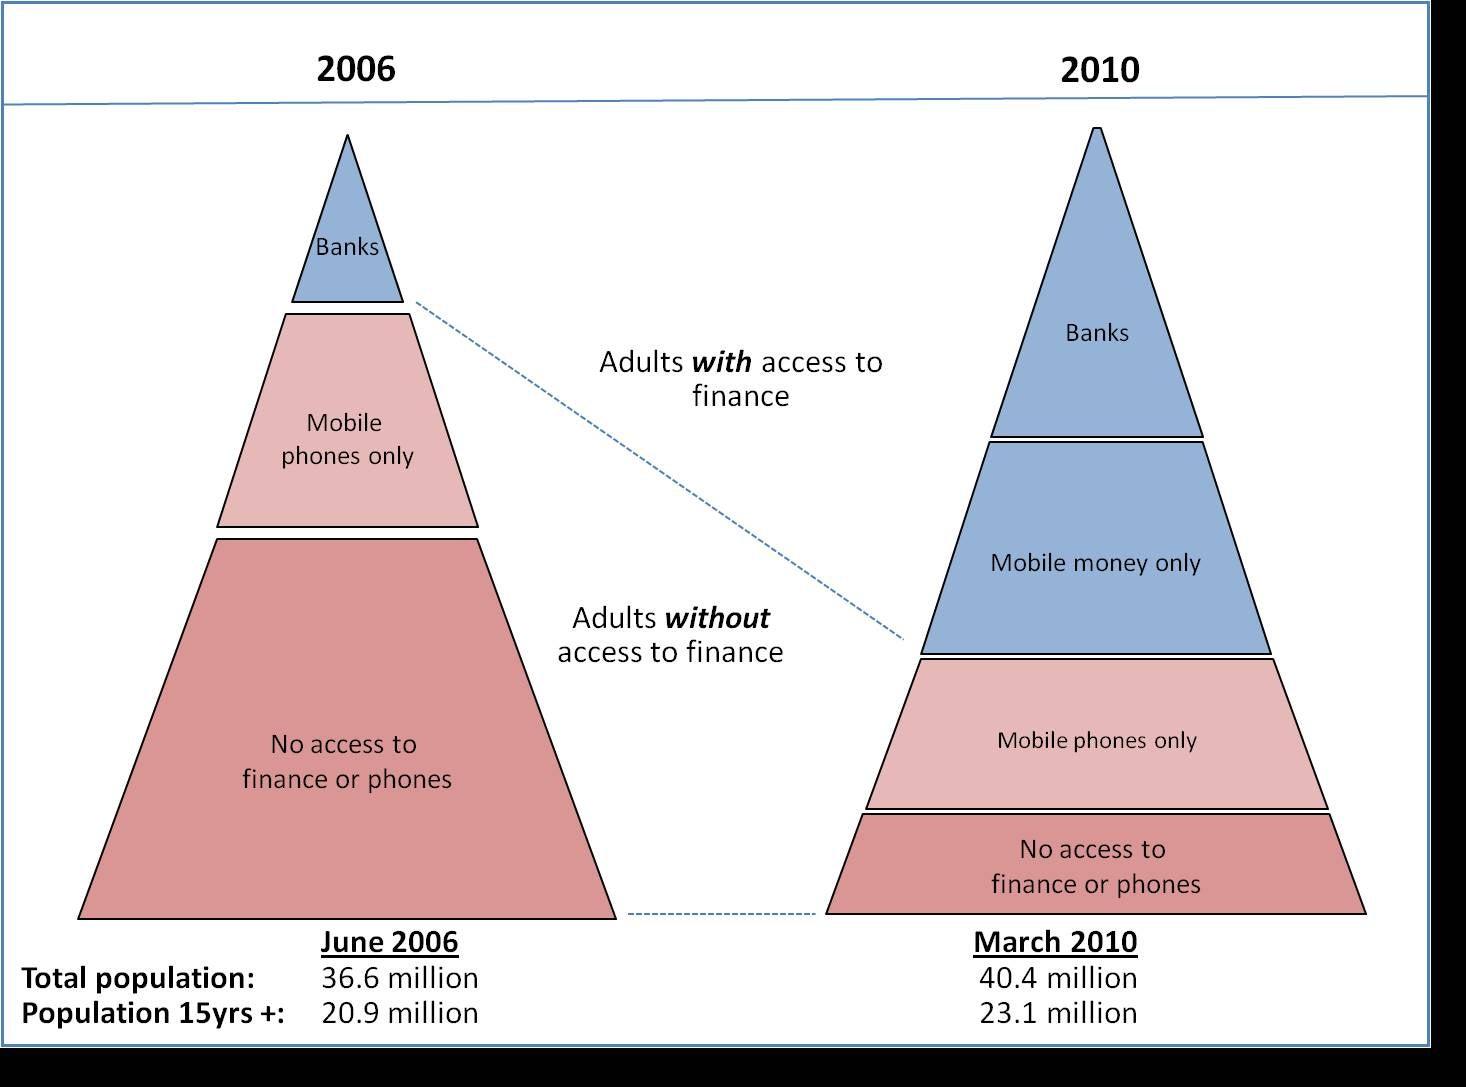 Kenya's telecom revolution and the impact of mobile money